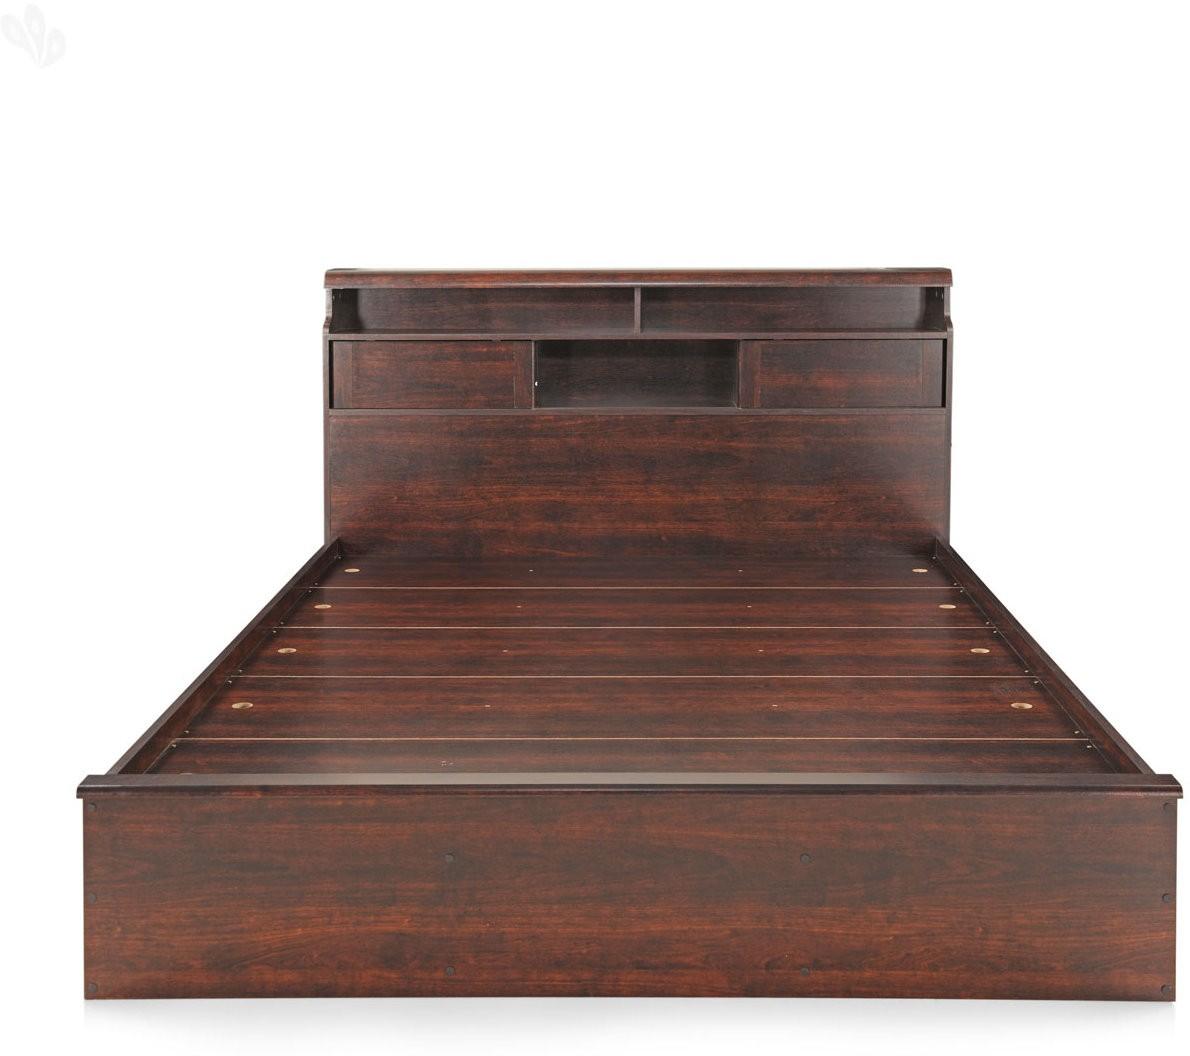 View Berlynoak Kiwi Engineered Wood Queen Bed(Finish Color -  Walnut) Furniture (Berlynoak)